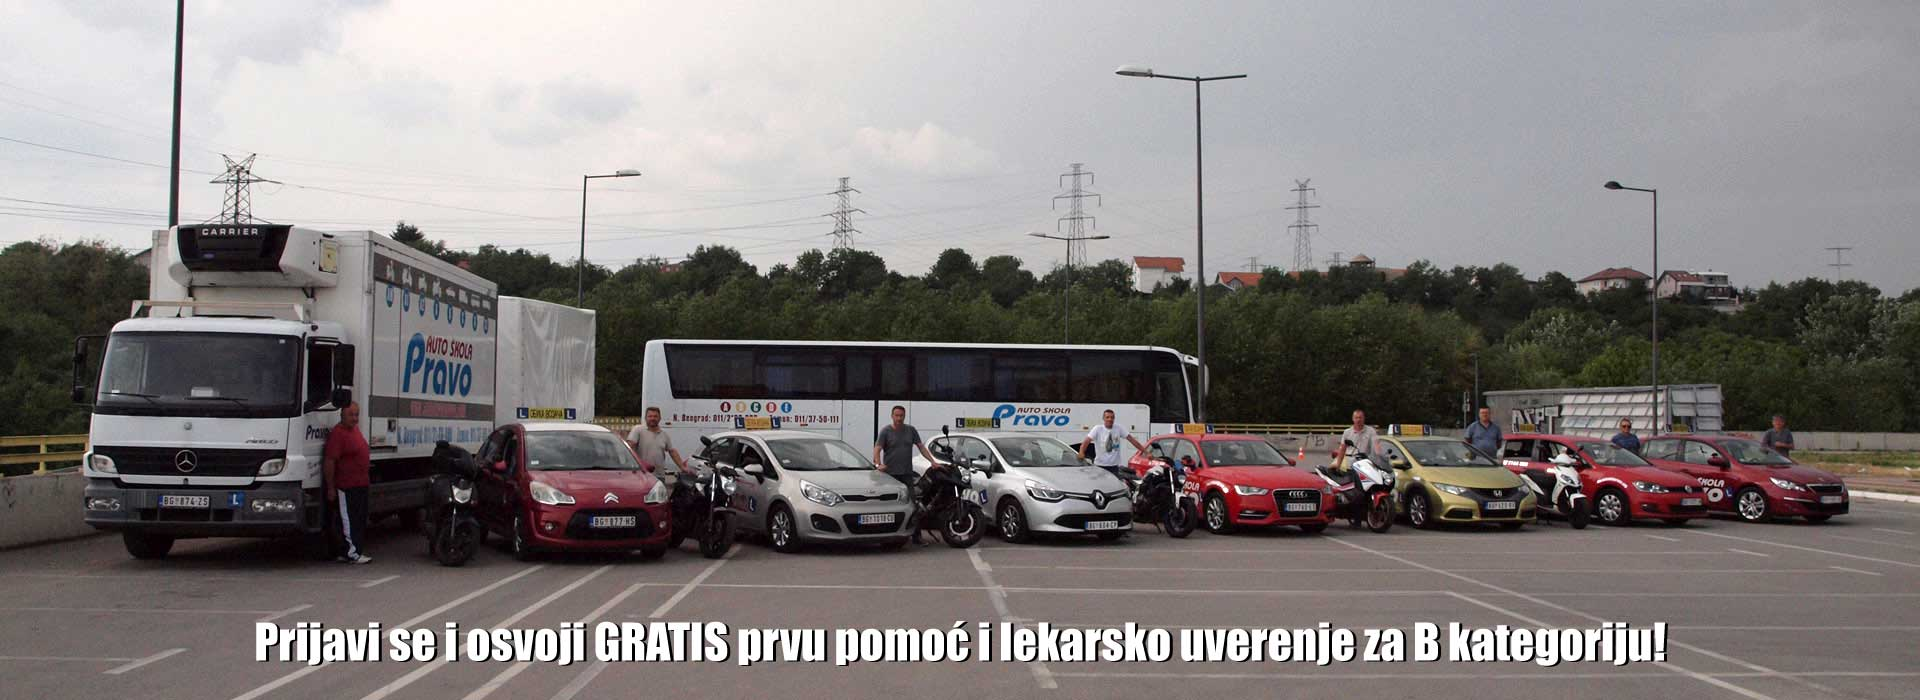 Auto škola Pravo Beograd, Novi Beograd